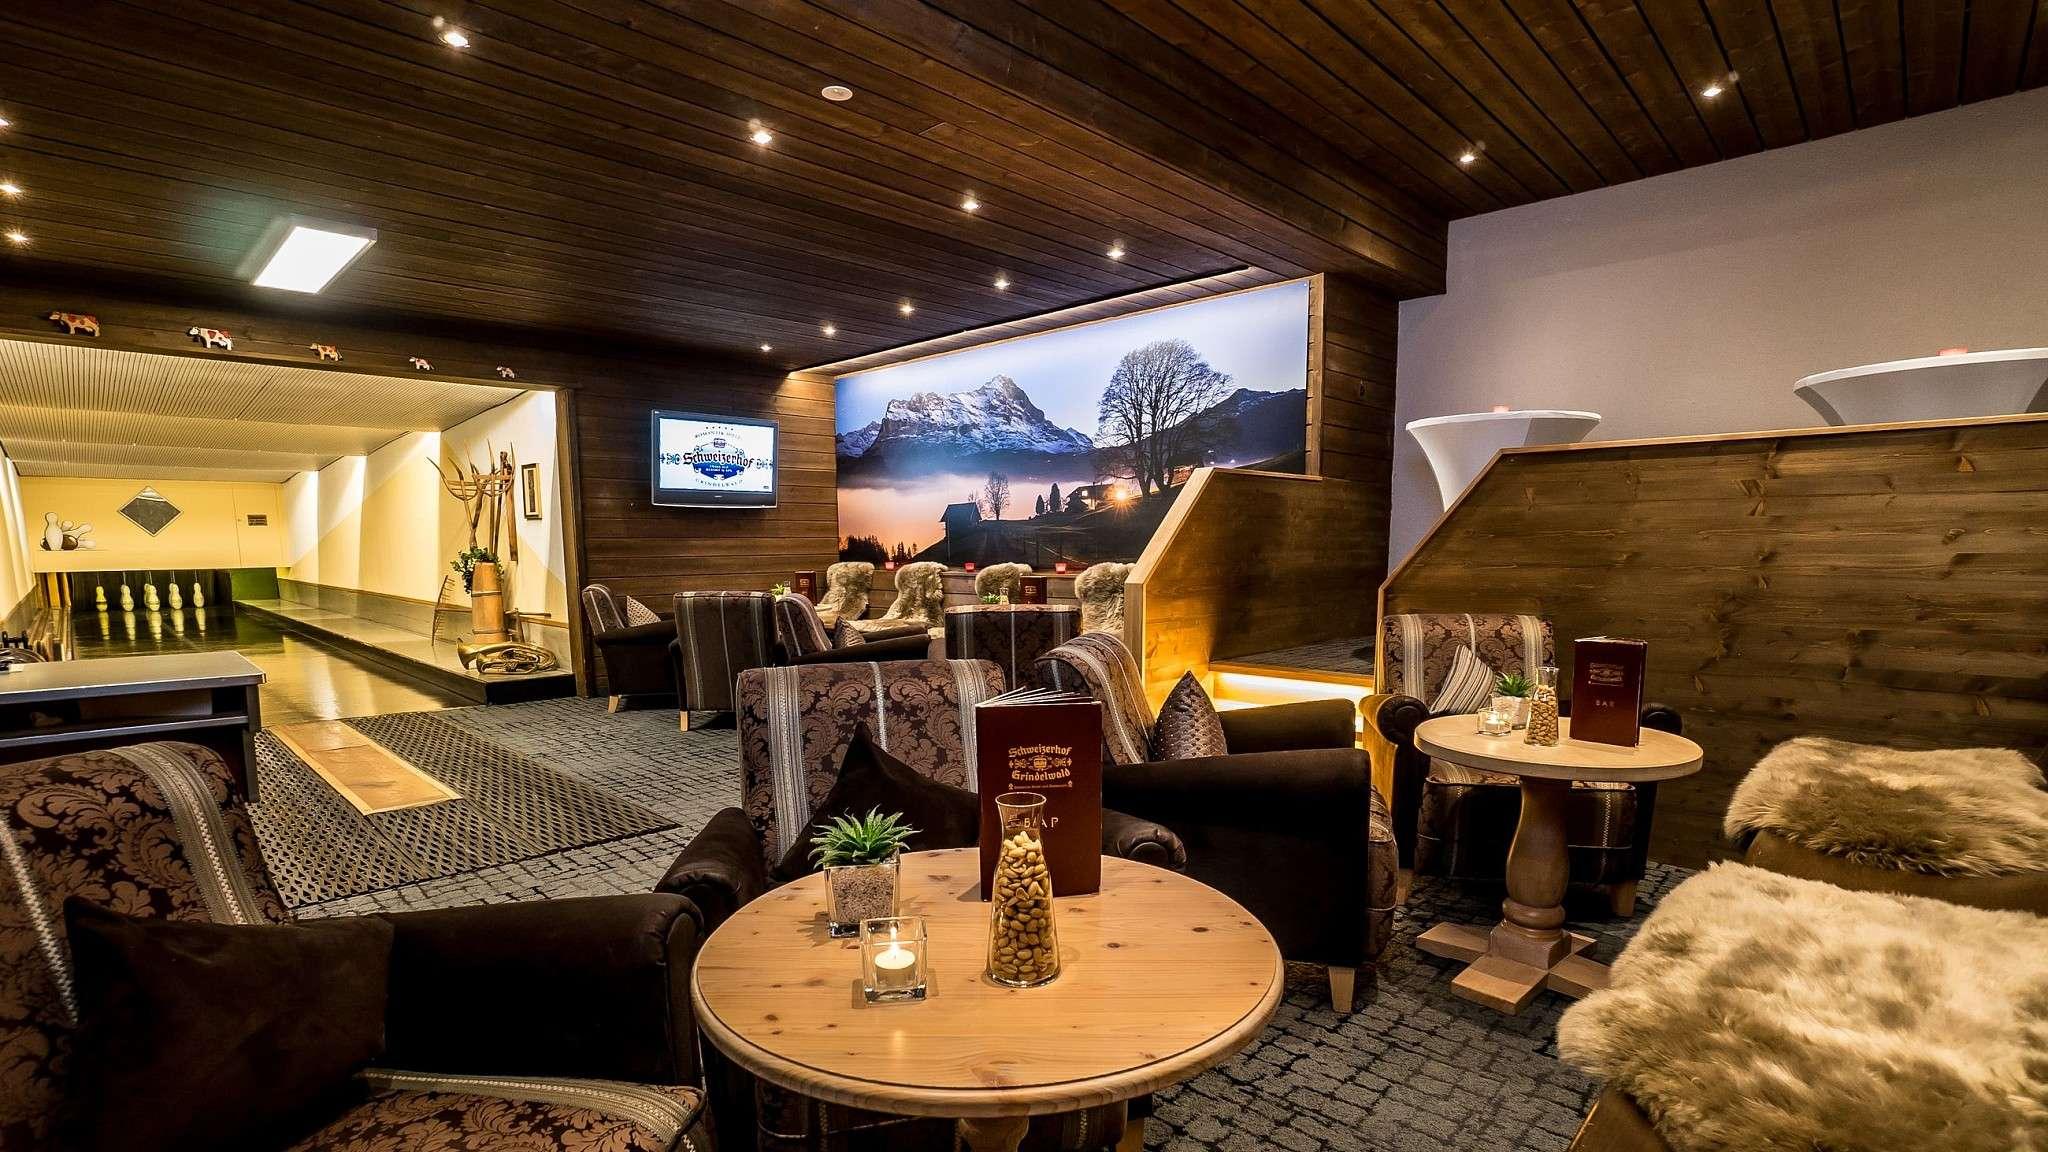 Romantik Hotel Schweizerhof / Swiss Alp Resort & SPA 5